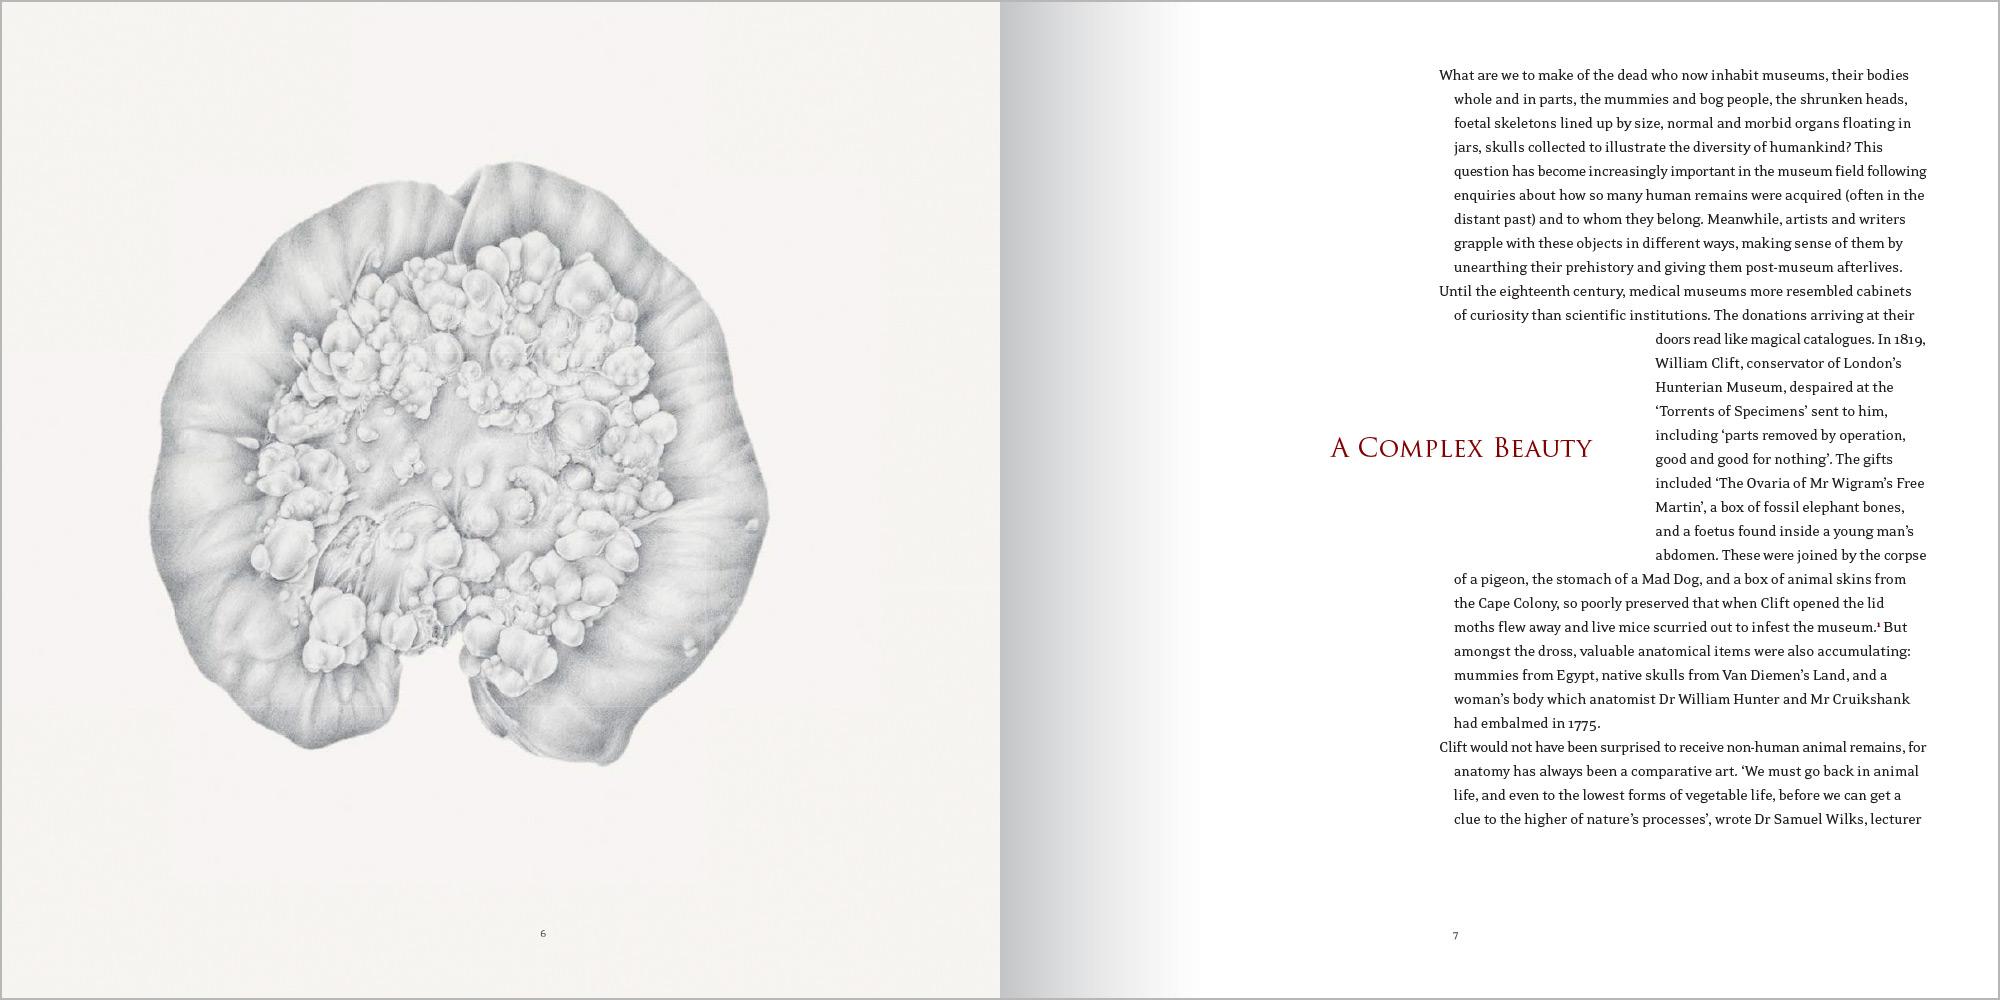 Catalogue-AComplexBeautySpread-2.jpg